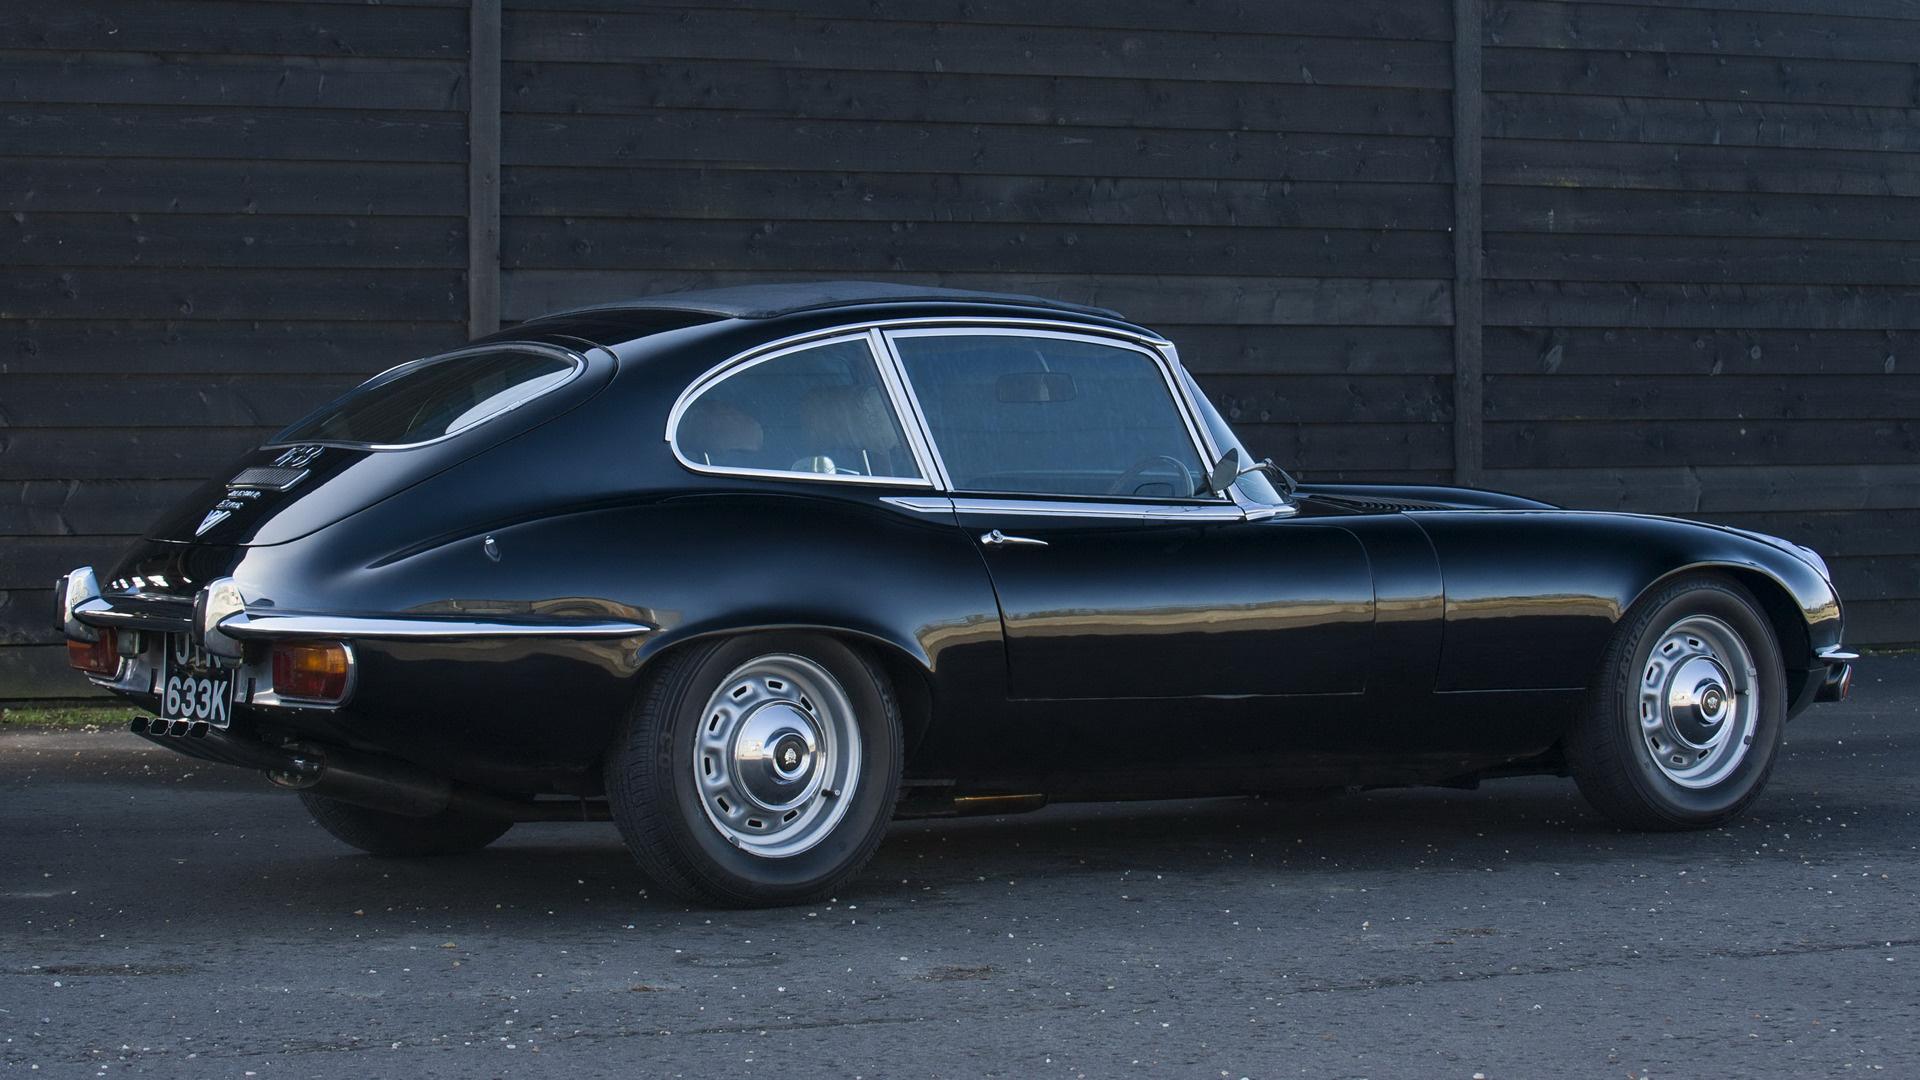 Jaguar F Type Coupe >> 1971 Jaguar E-Type V12 2+2 Coupe (UK) - Wallpapers and HD Images | Car Pixel